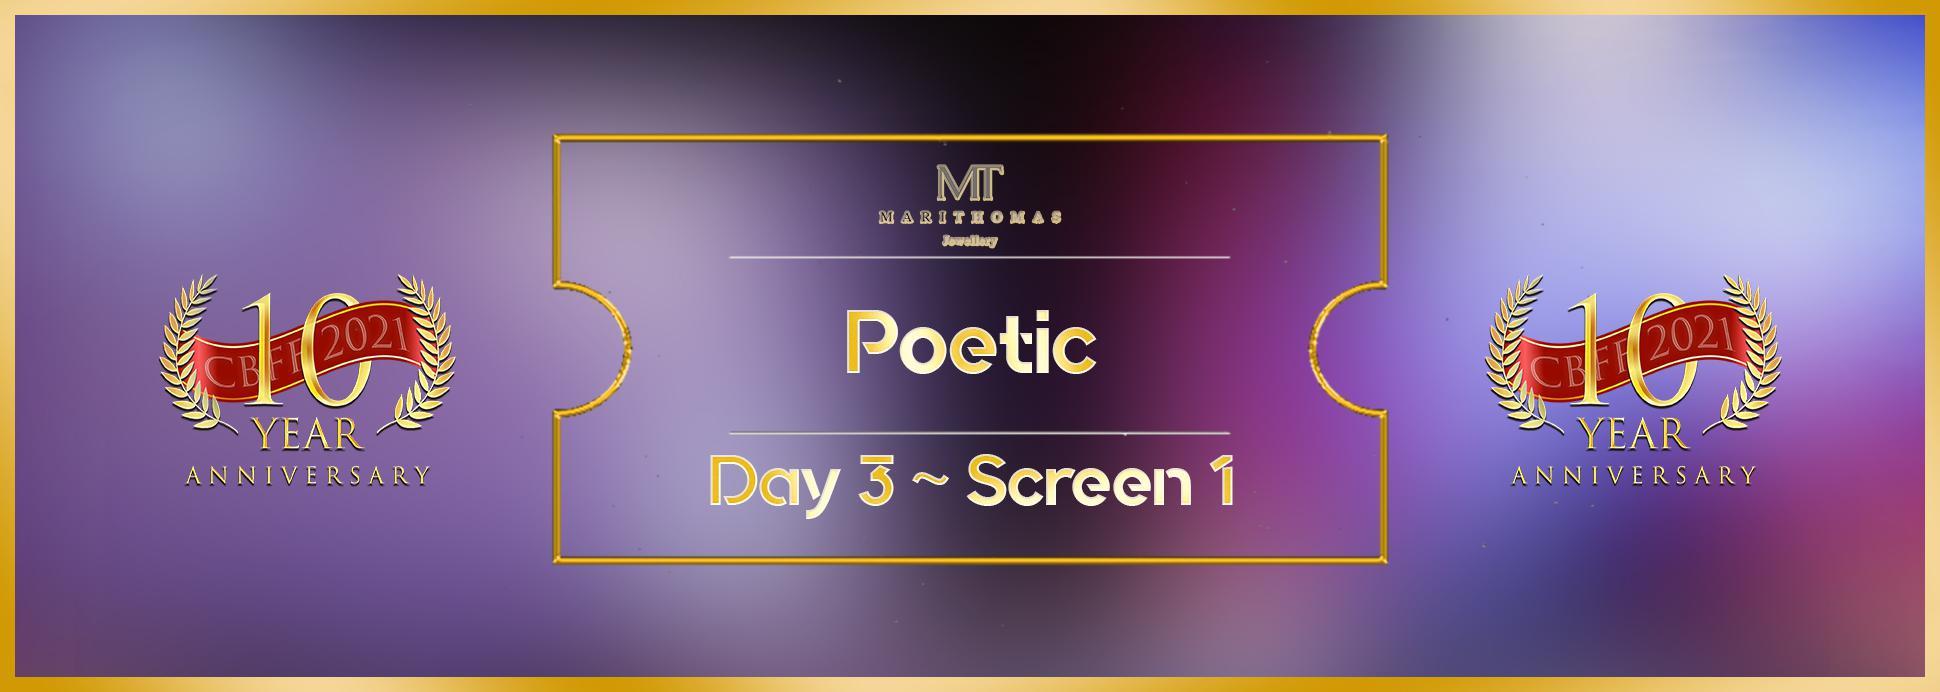 Day 3, Screen 1: Poetic Short Film